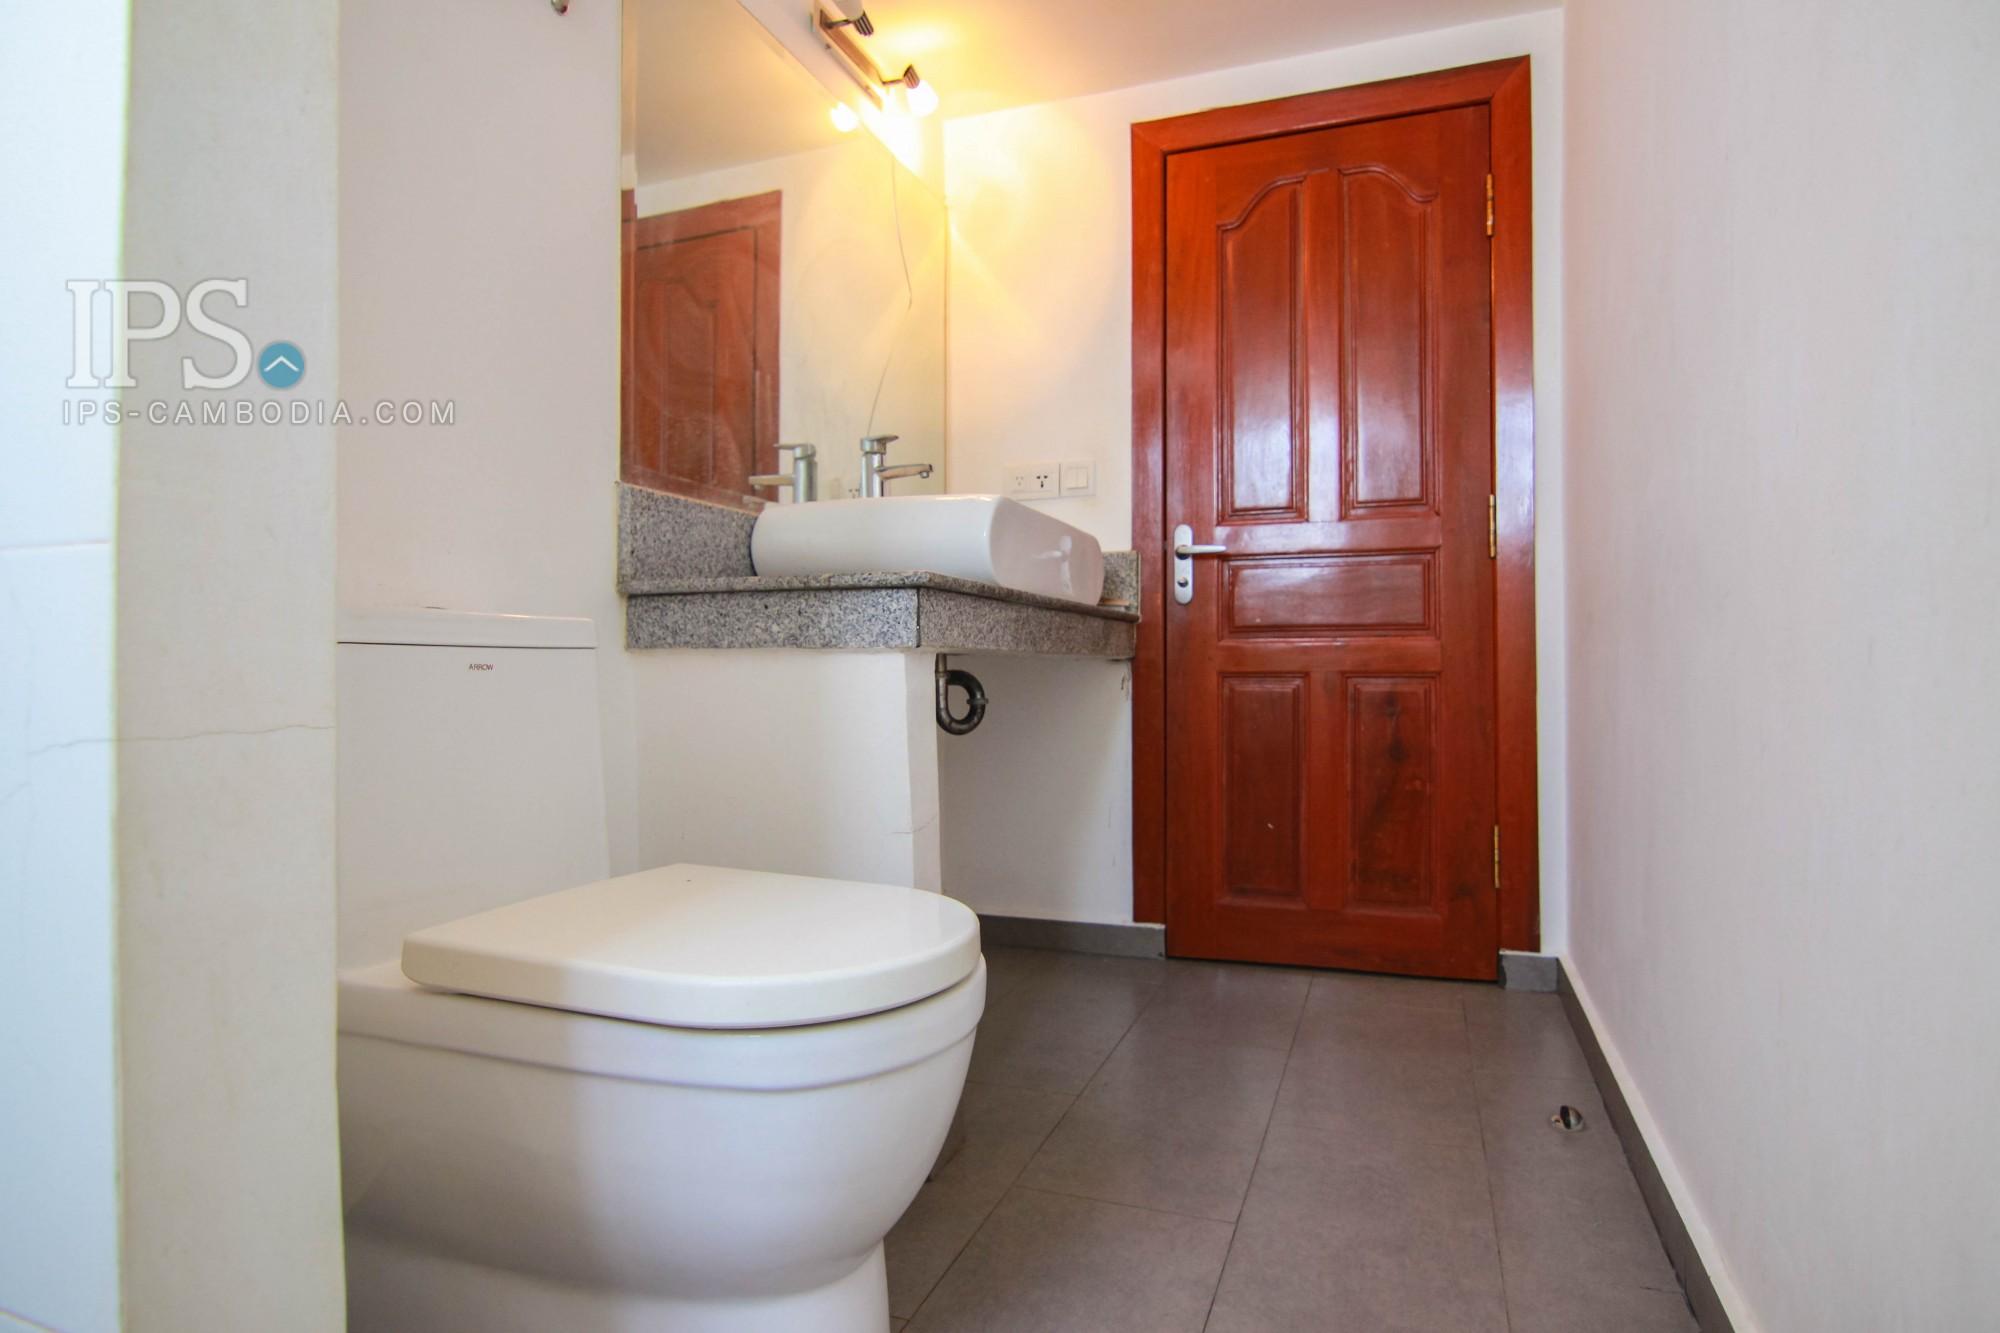 1 Bedroom Apartment Sale - 7 Makara